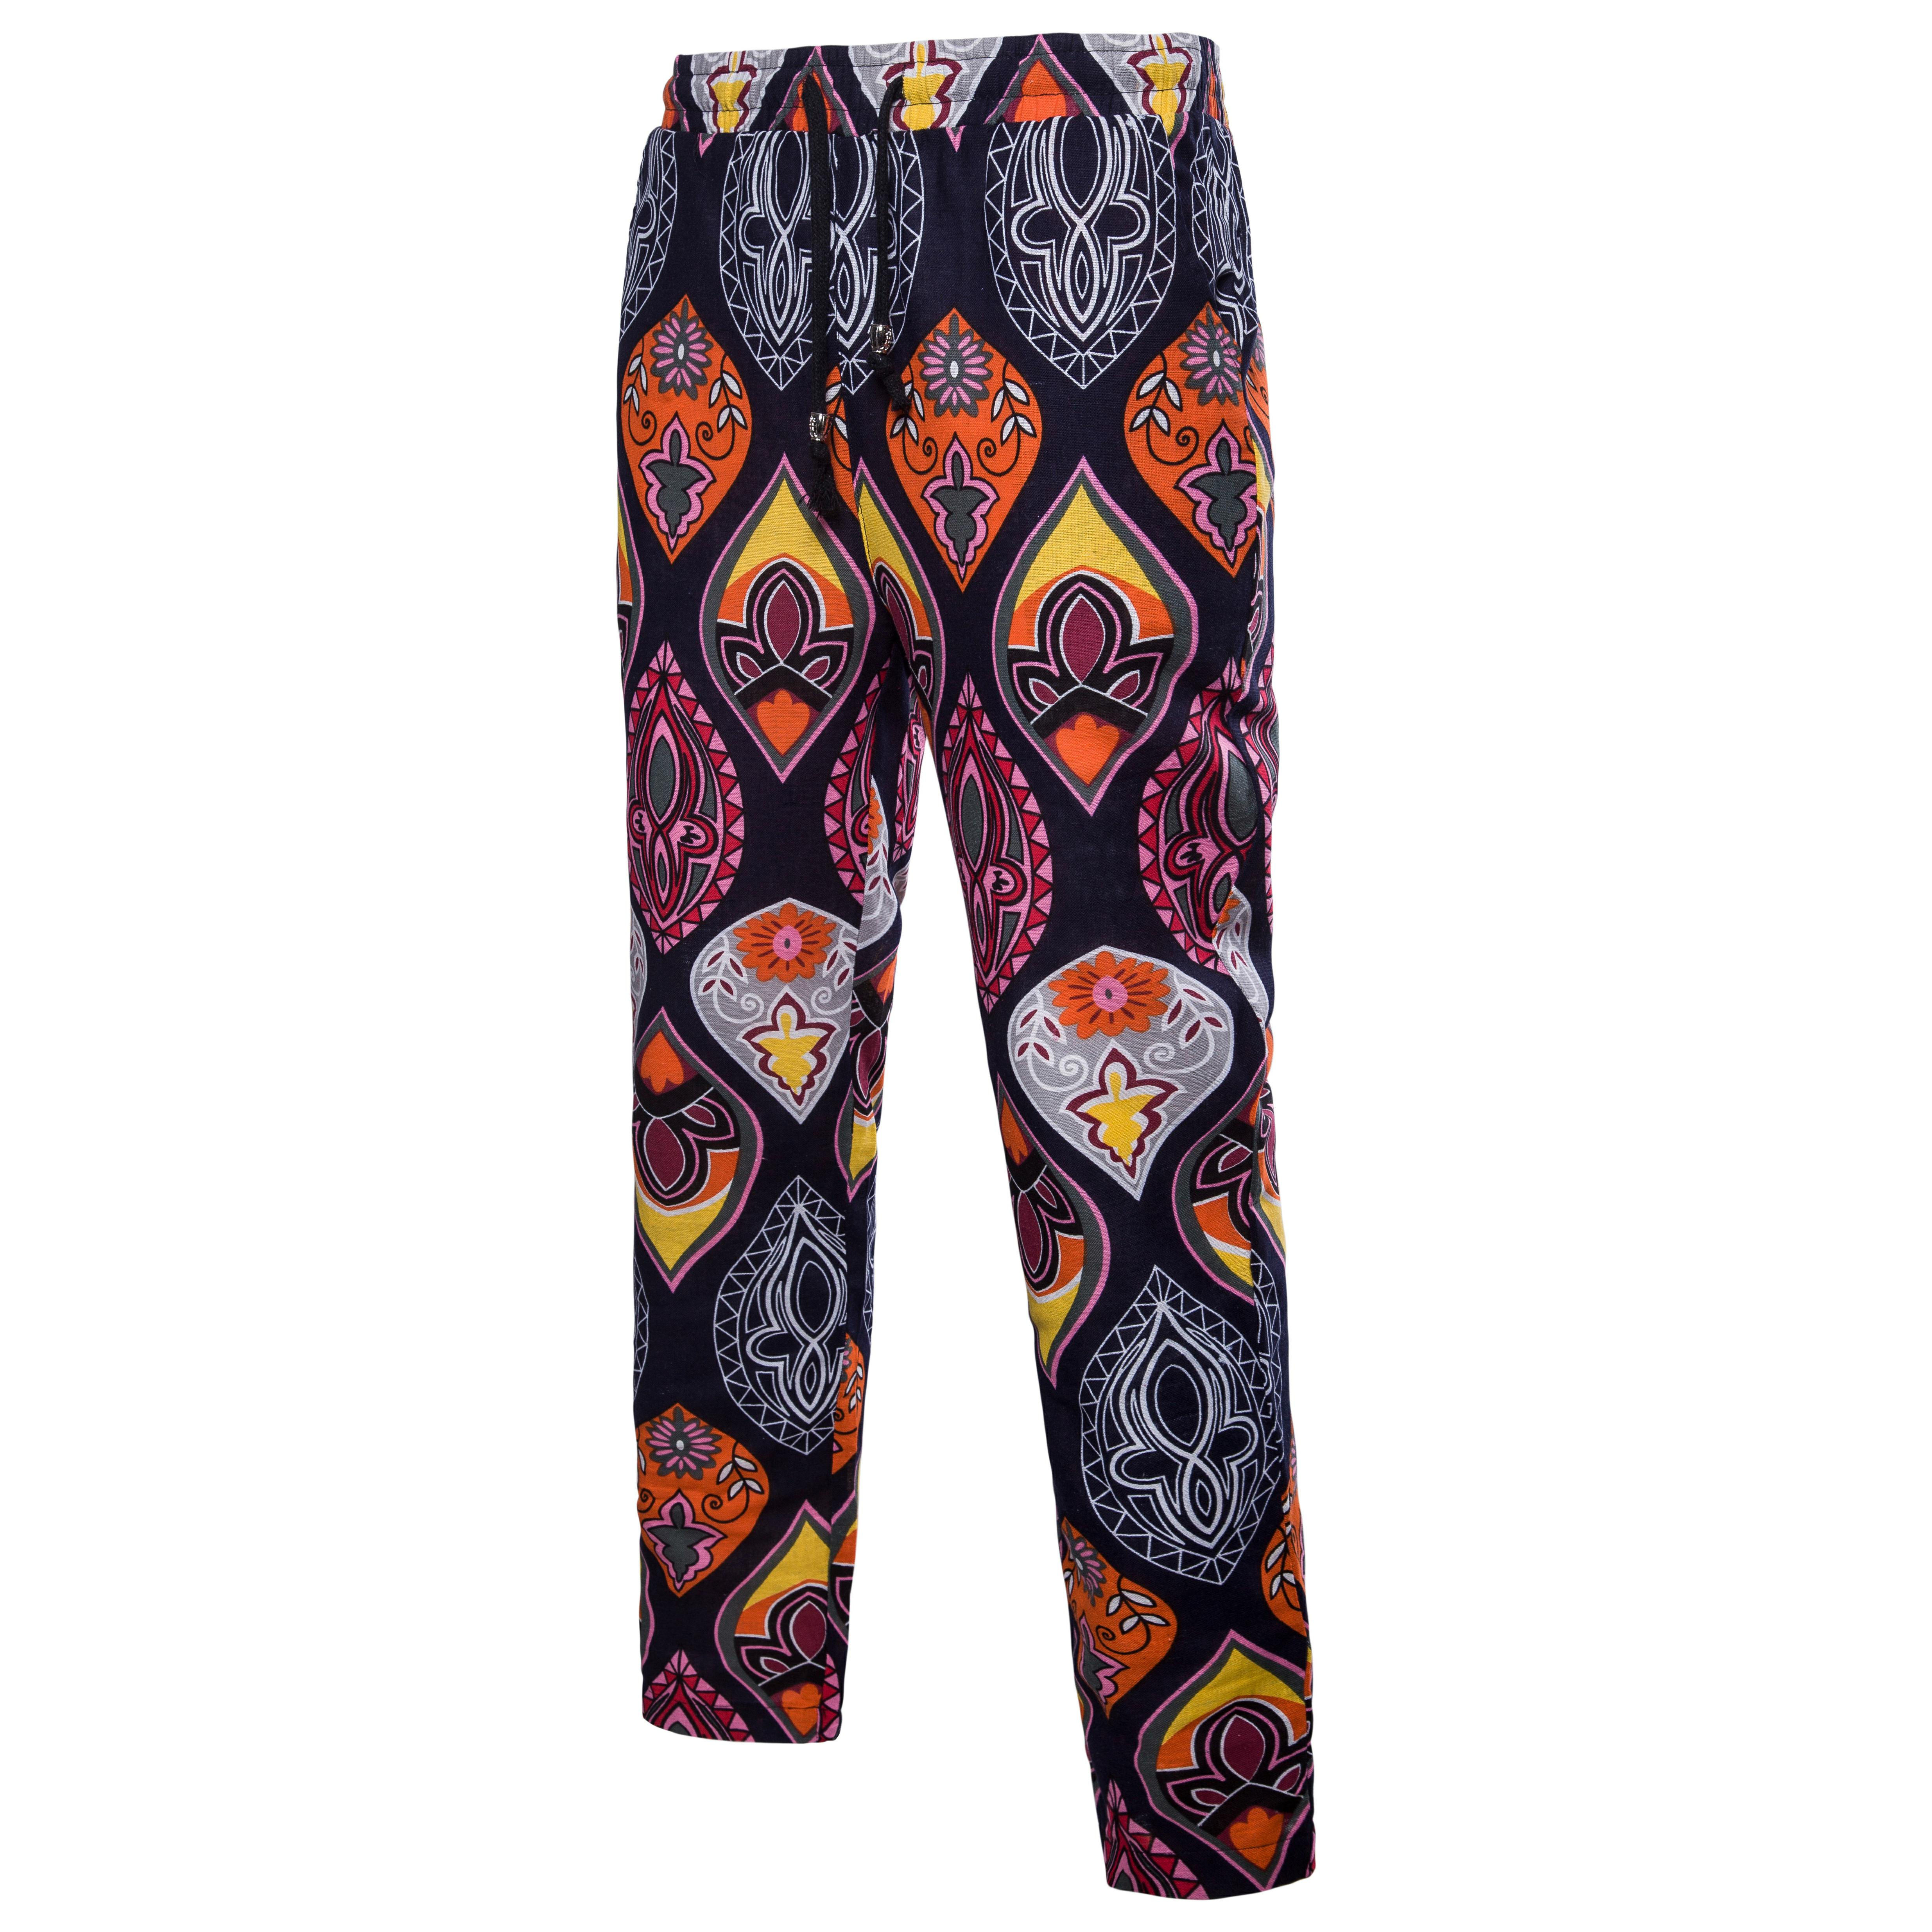 d7587e84b7 Compre Pantalones Otton Y Lino De Tela Para Hombres